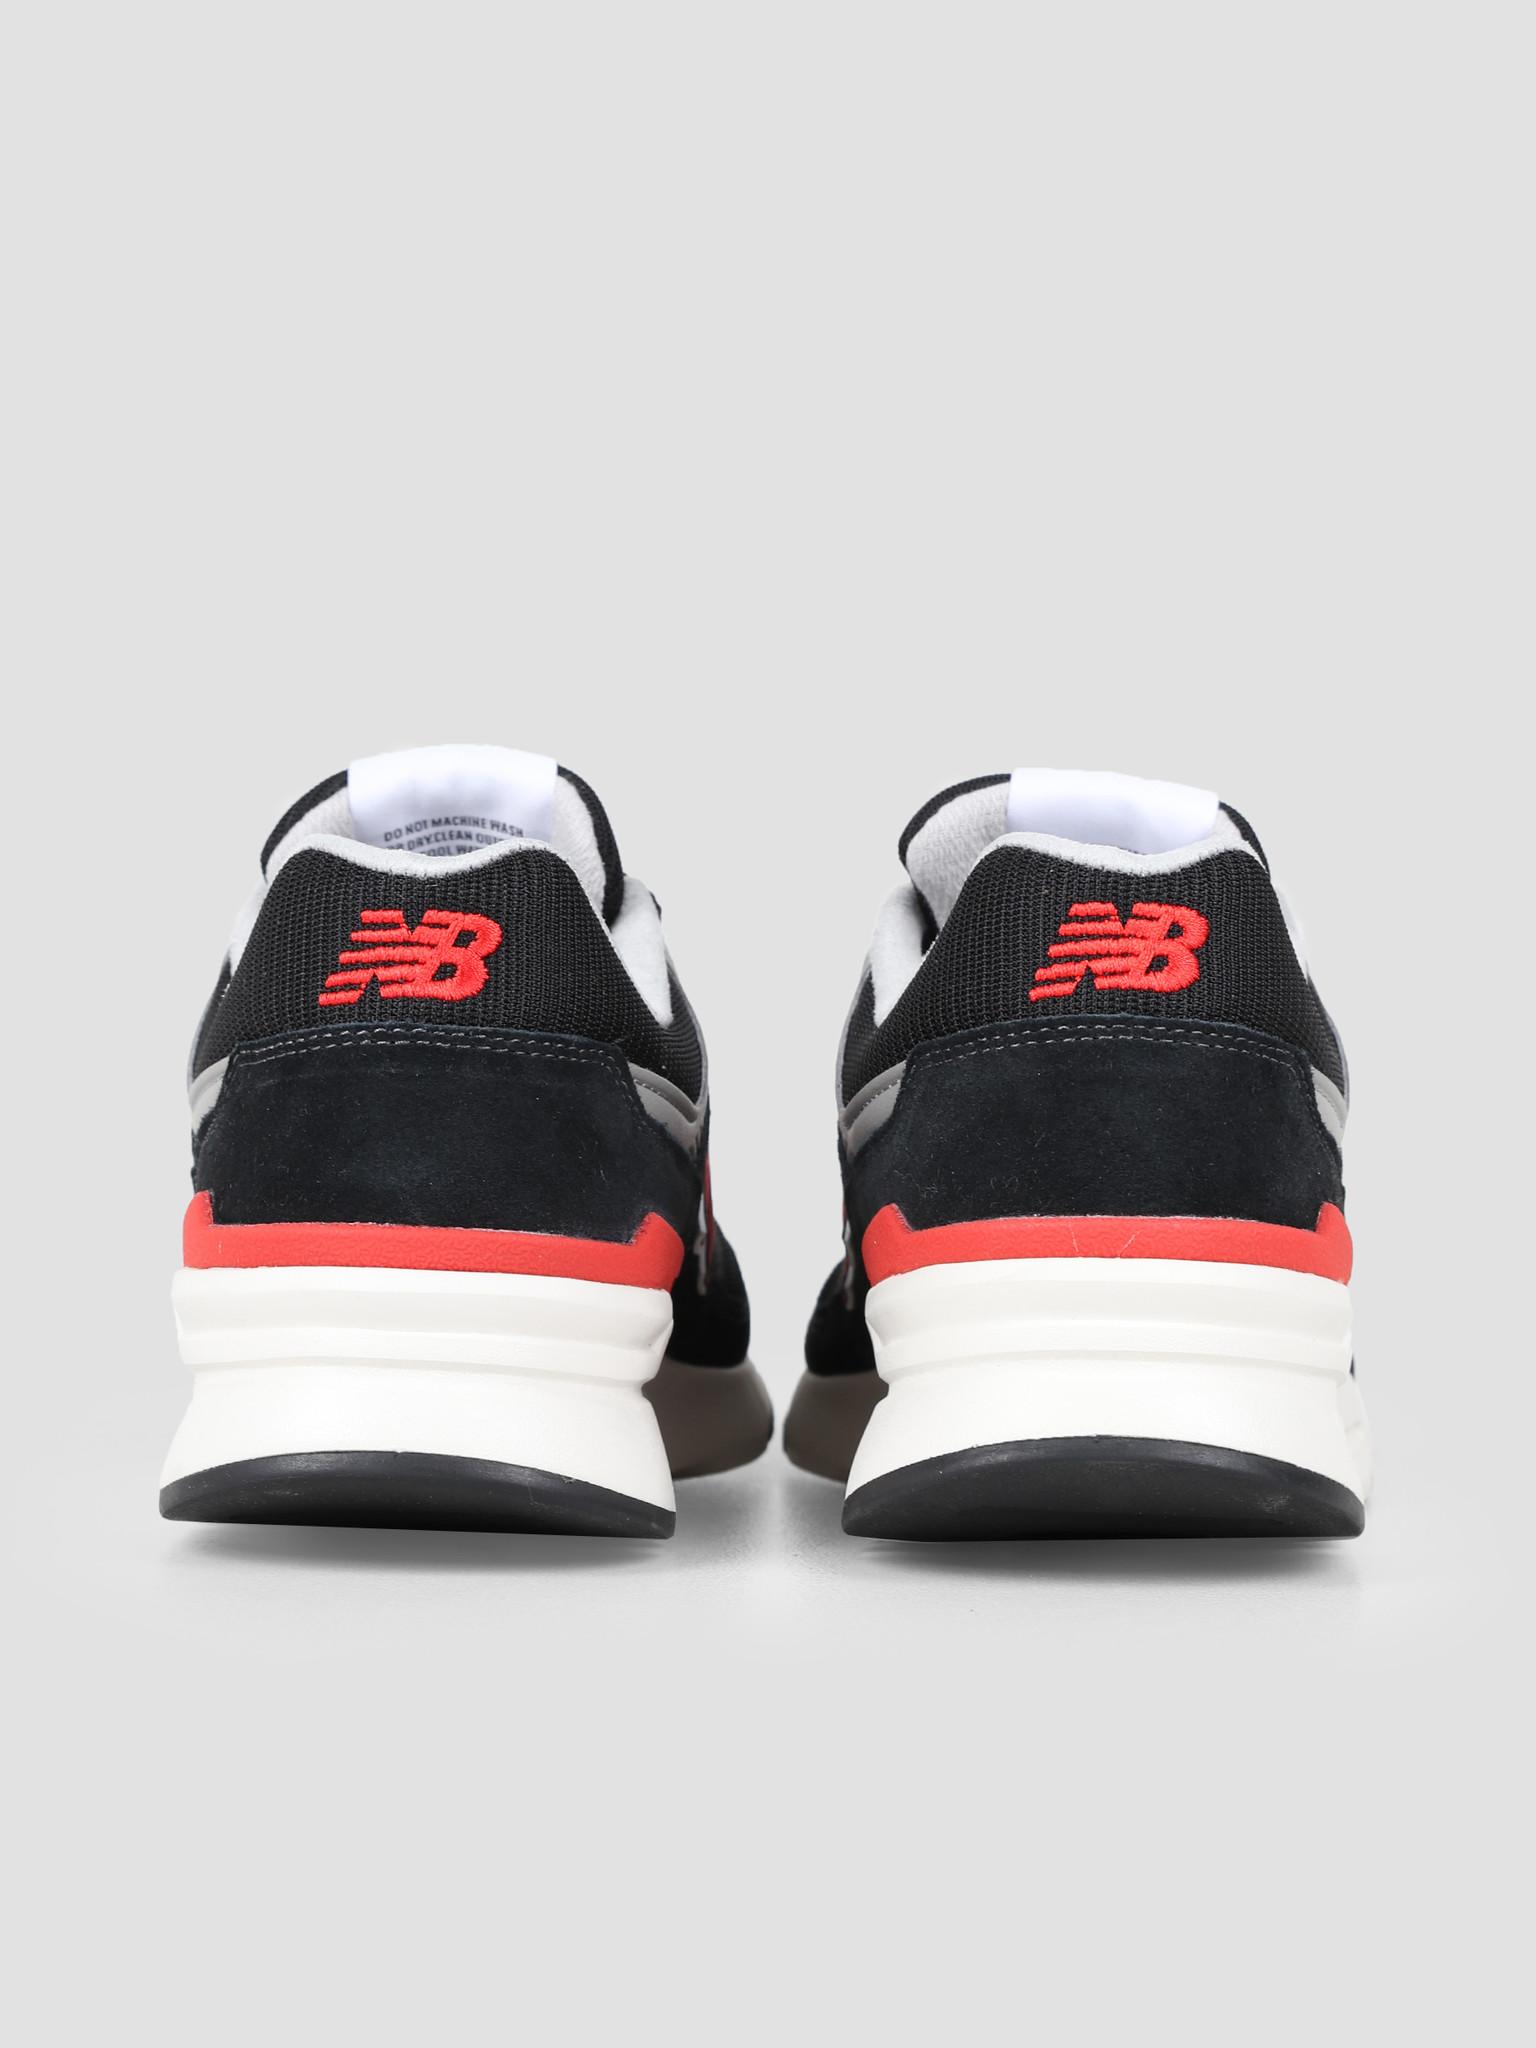 New Balance New Balance CM997 D Black Red 738151-60